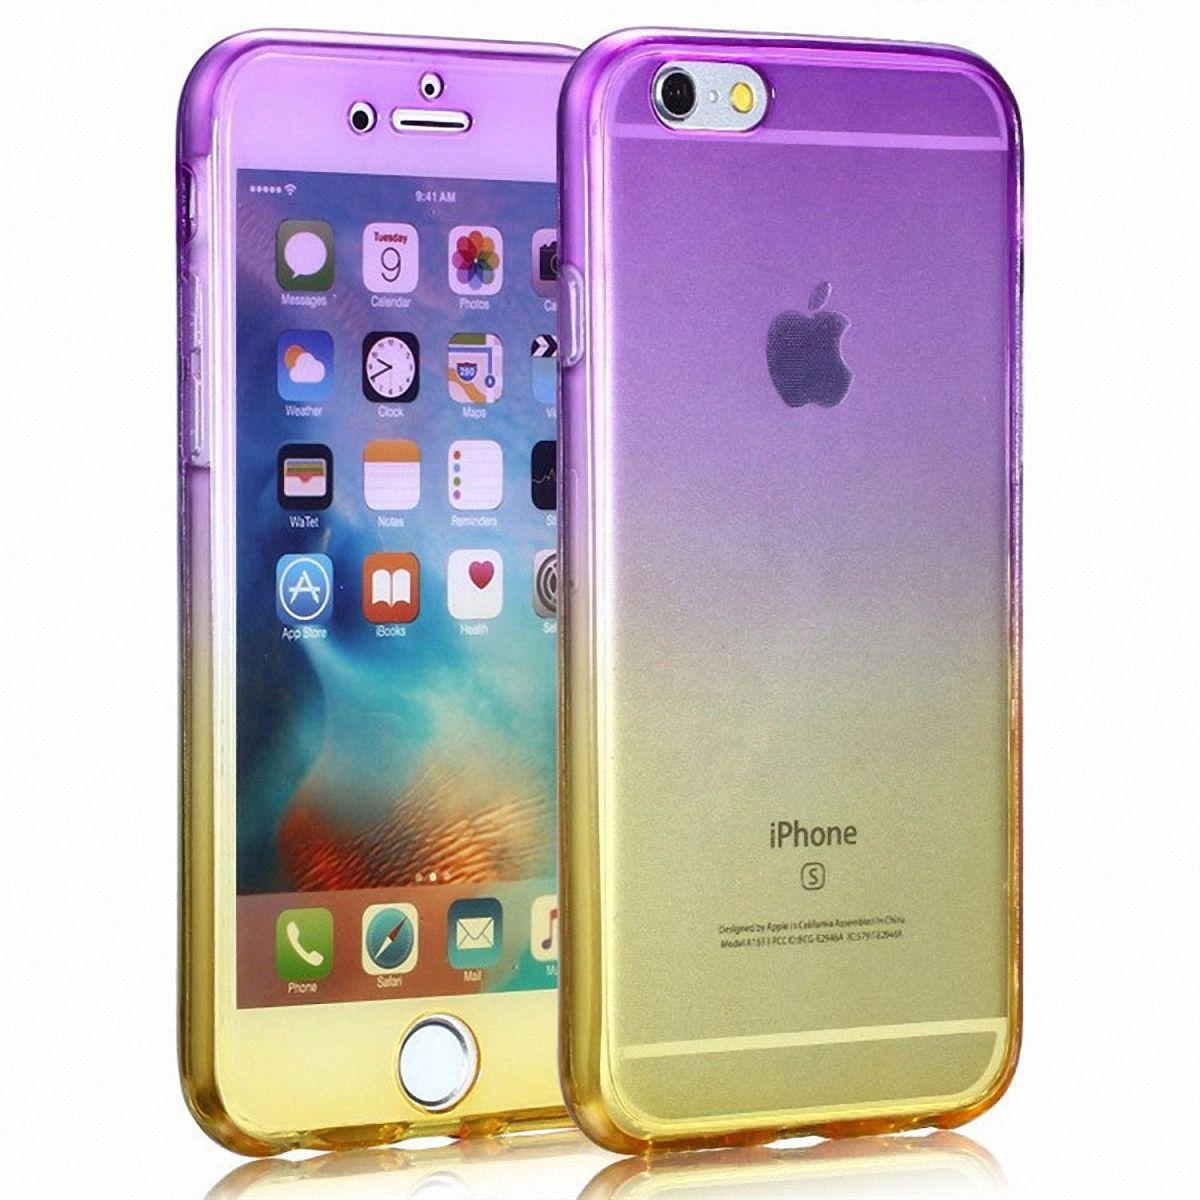 Crystal Case Hülle für Apple iPhone SE 2020 Lila Gelb Rahmen Full Body